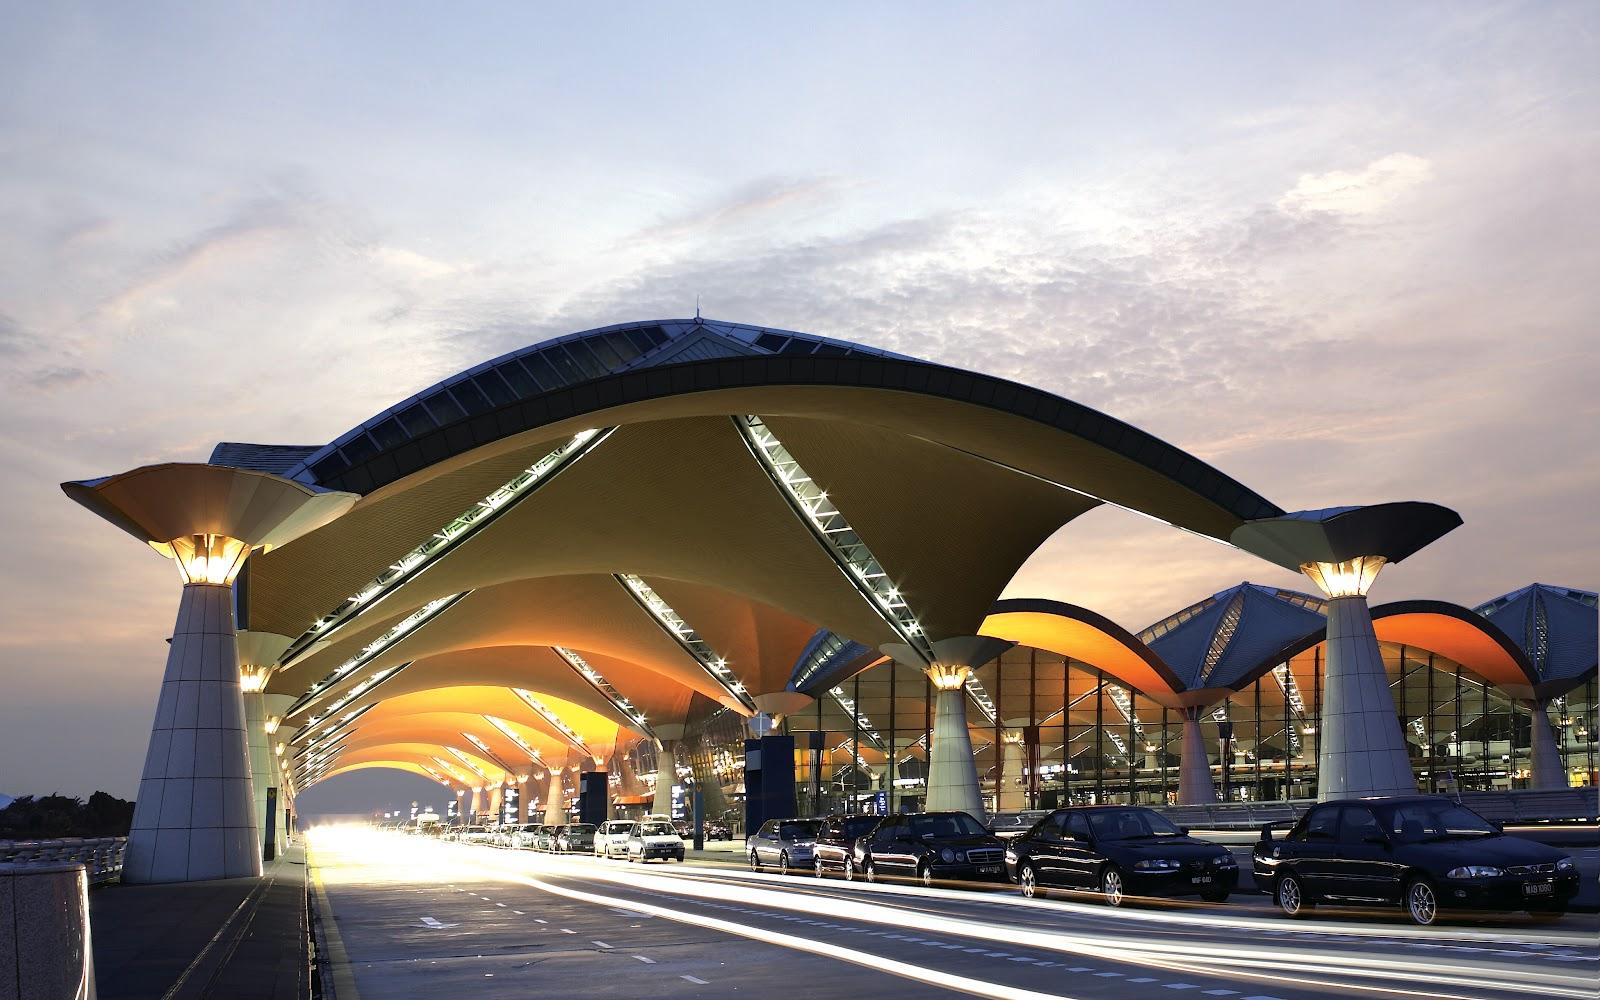 klia2 passenger guide - Kuala Lumpur International Airport